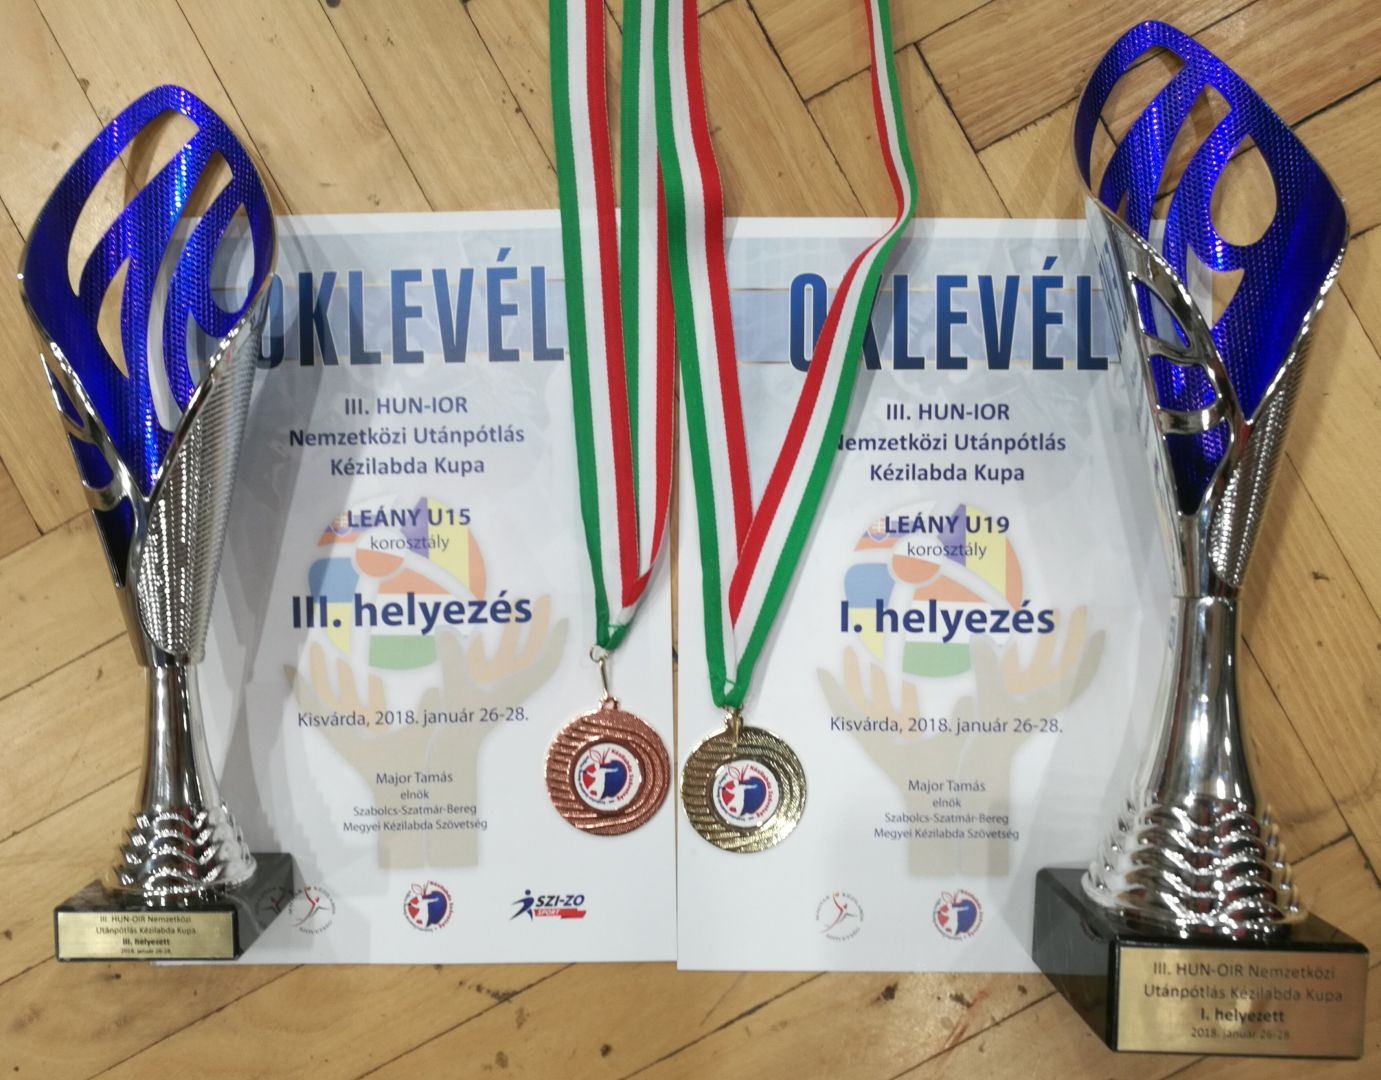 Turnaj Kisvarda 01/2018